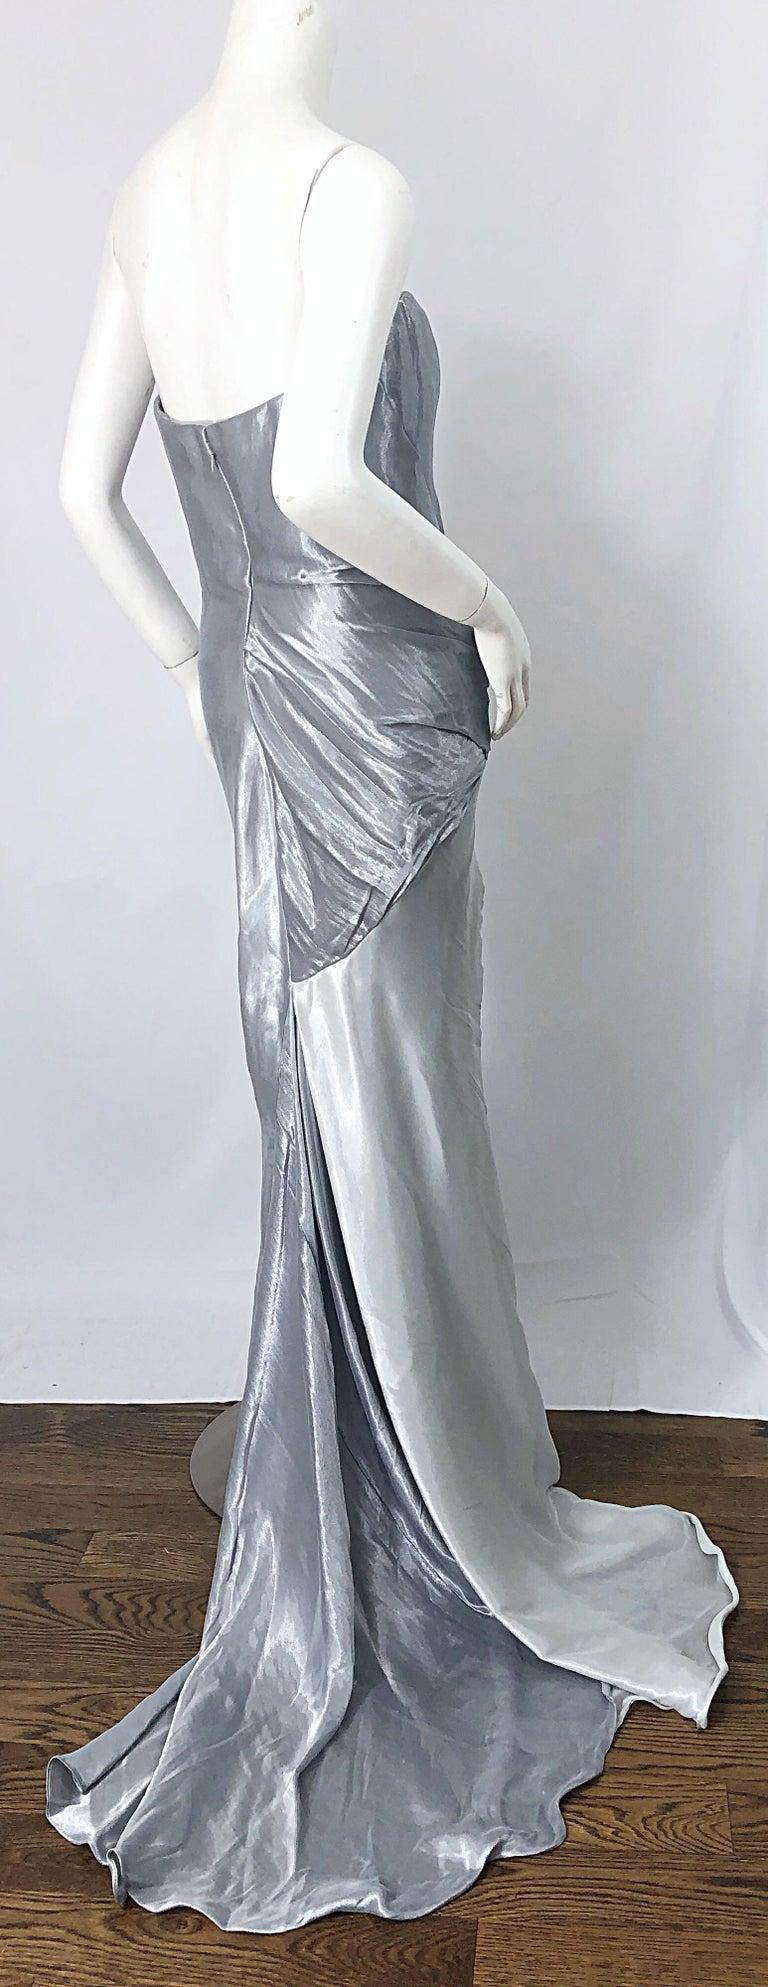 Donna Karan 1990s Size 4 Silver Grecian Metallic Strapless Vintage Silk 90s Gown For Sale 5